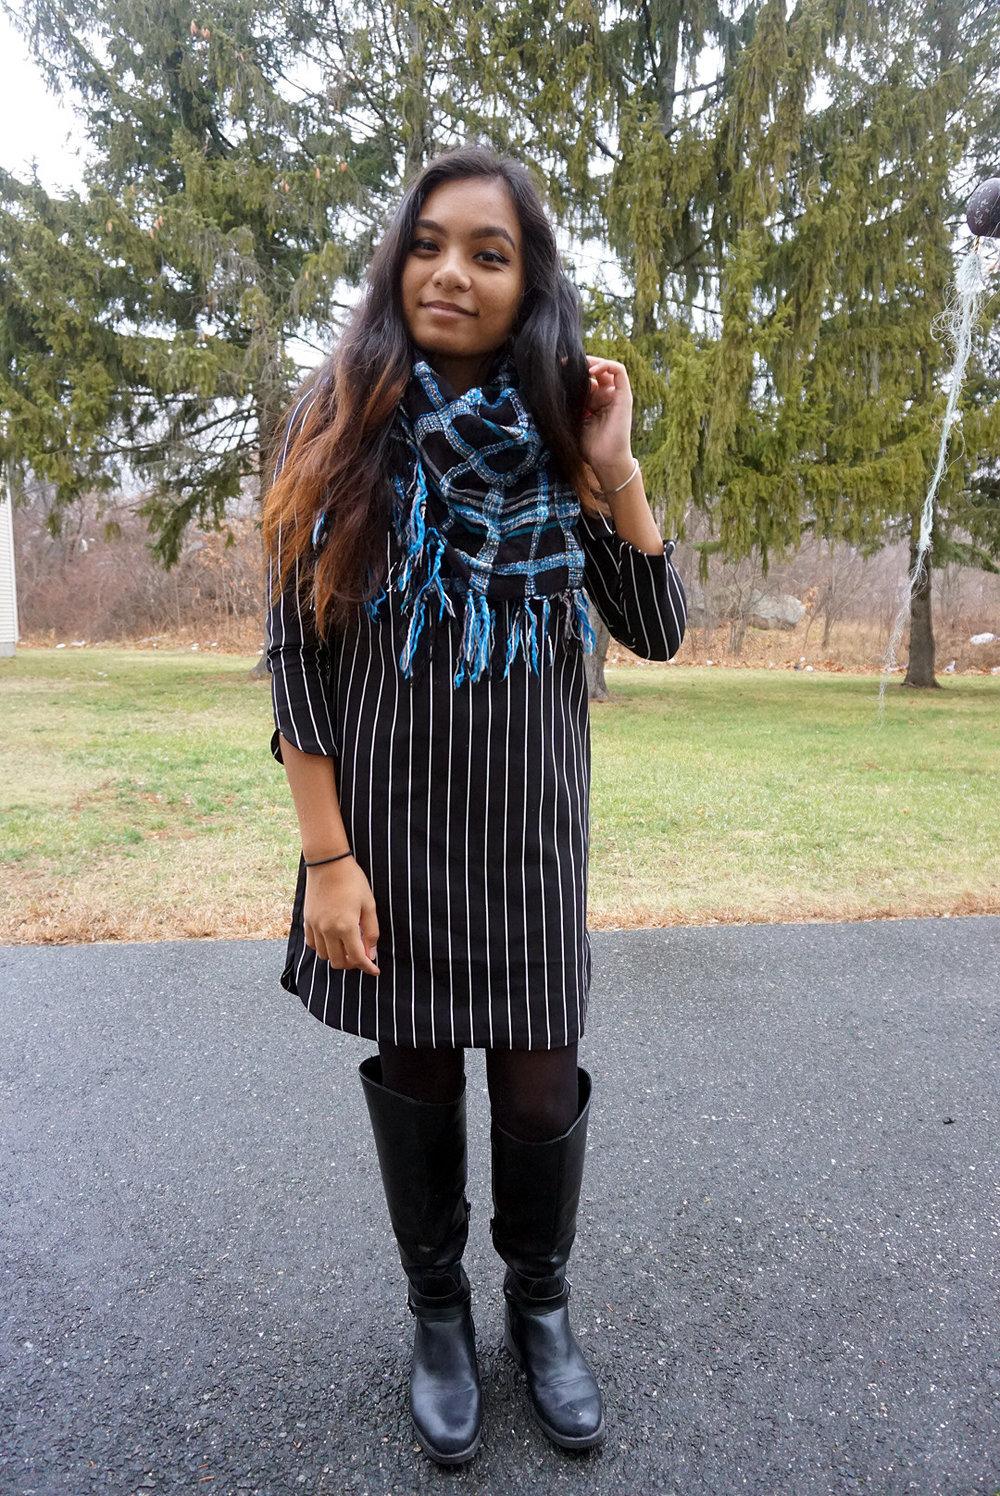 Black-White-Striped-Dress-Blogger-Style-LINDATENCHITRAN-19-1080x1616.jpg